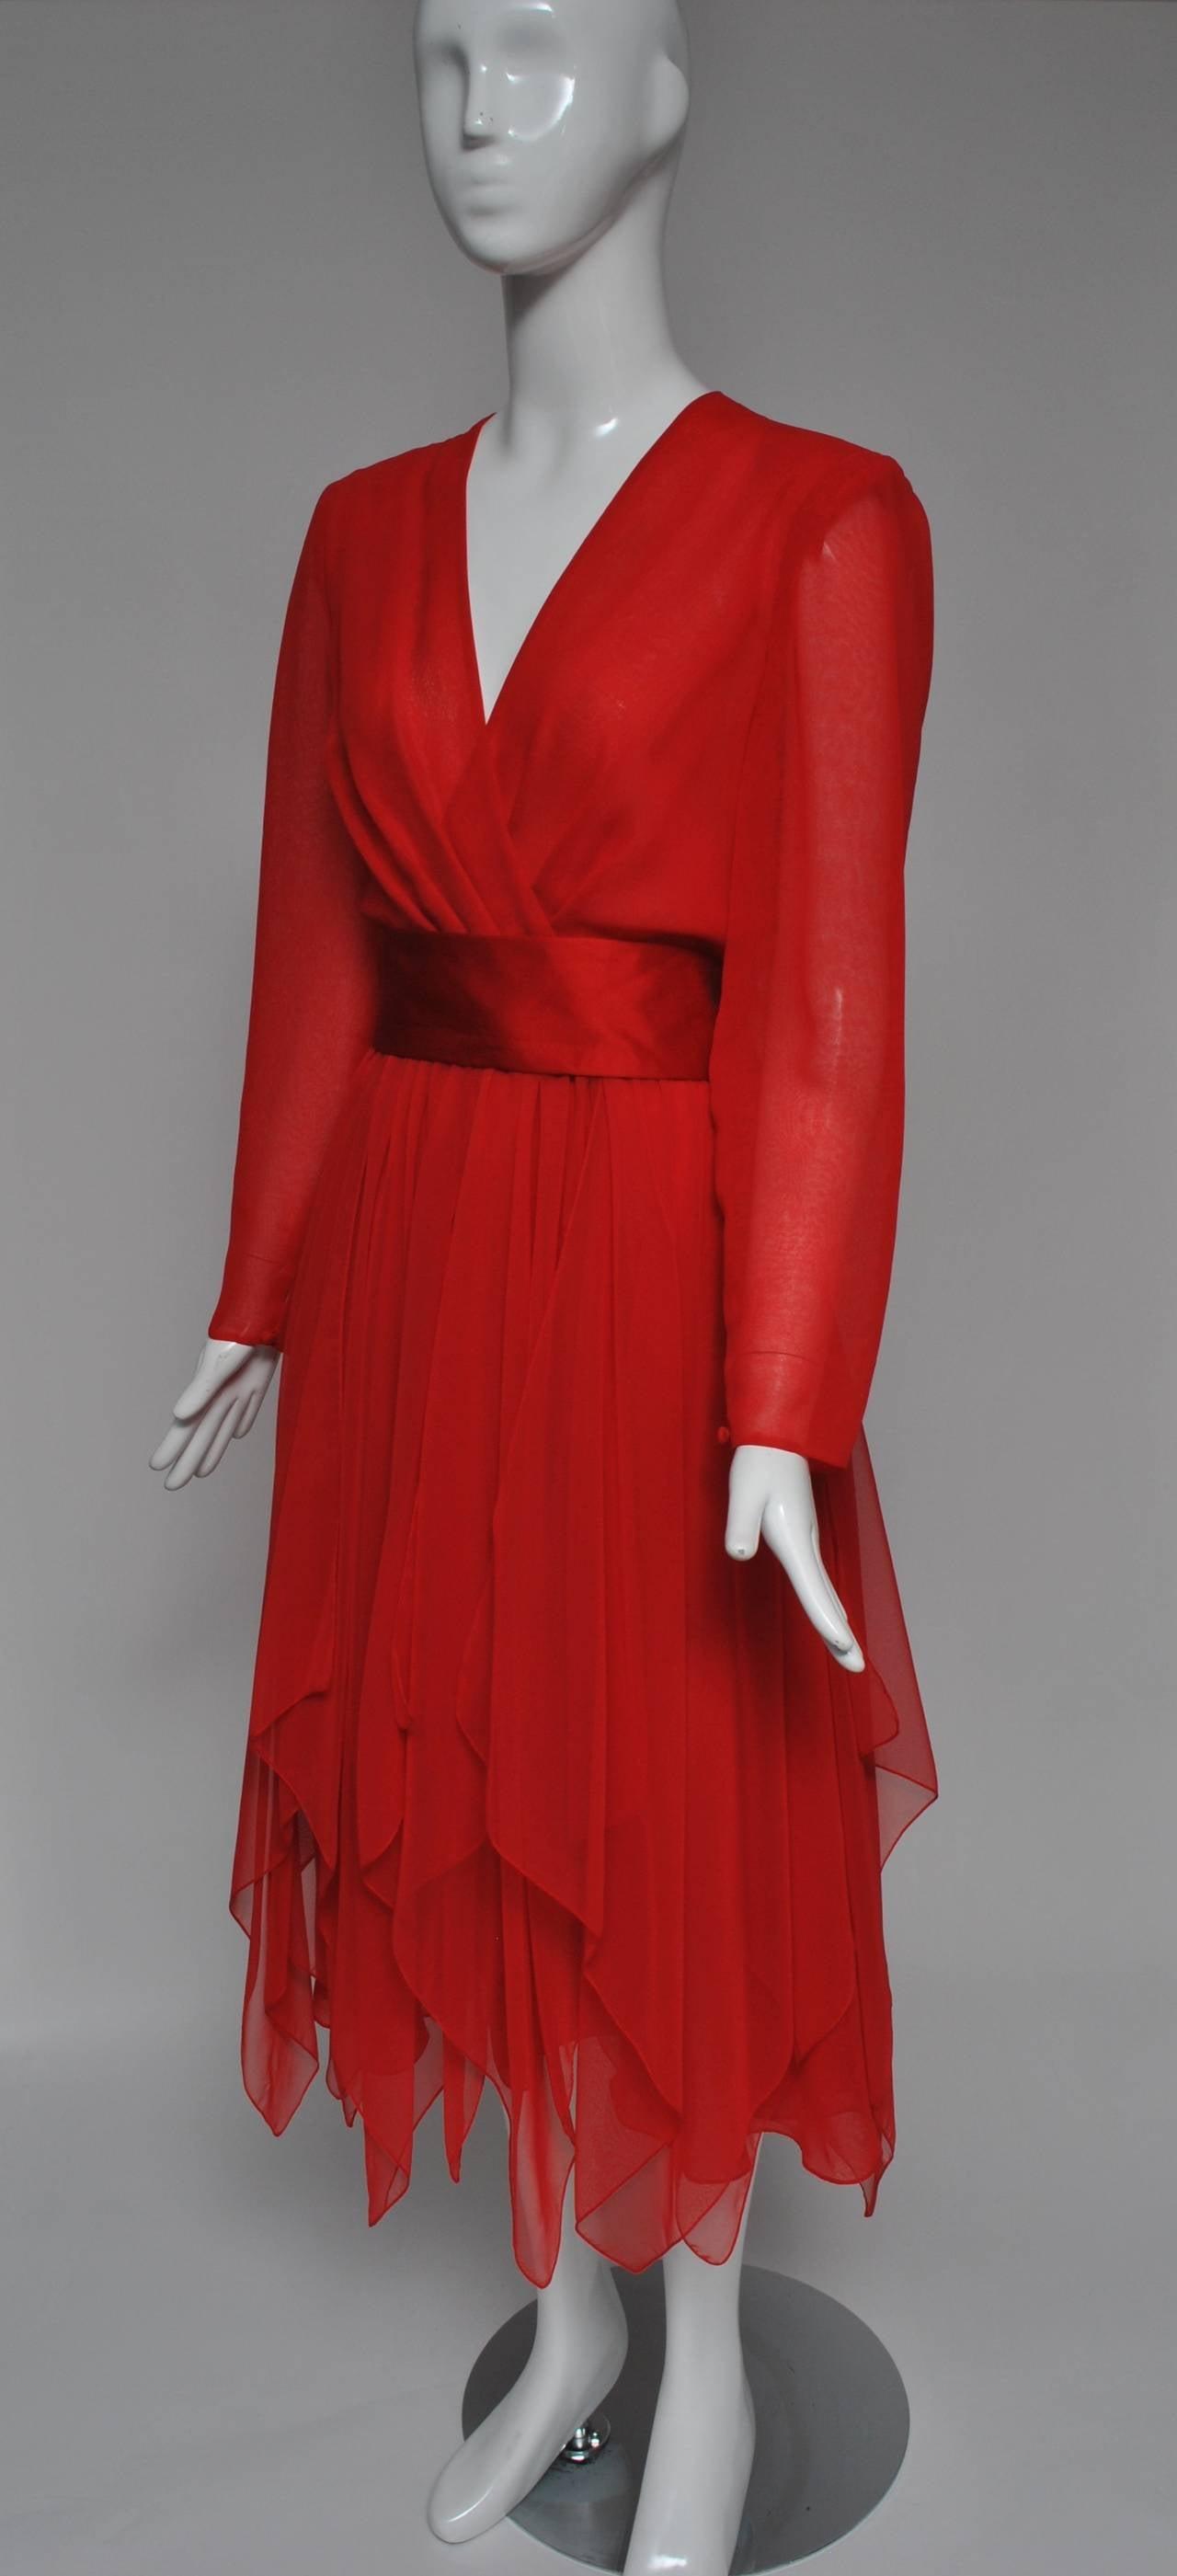 Estevez Red Chiffon Handkerchief Dress 4